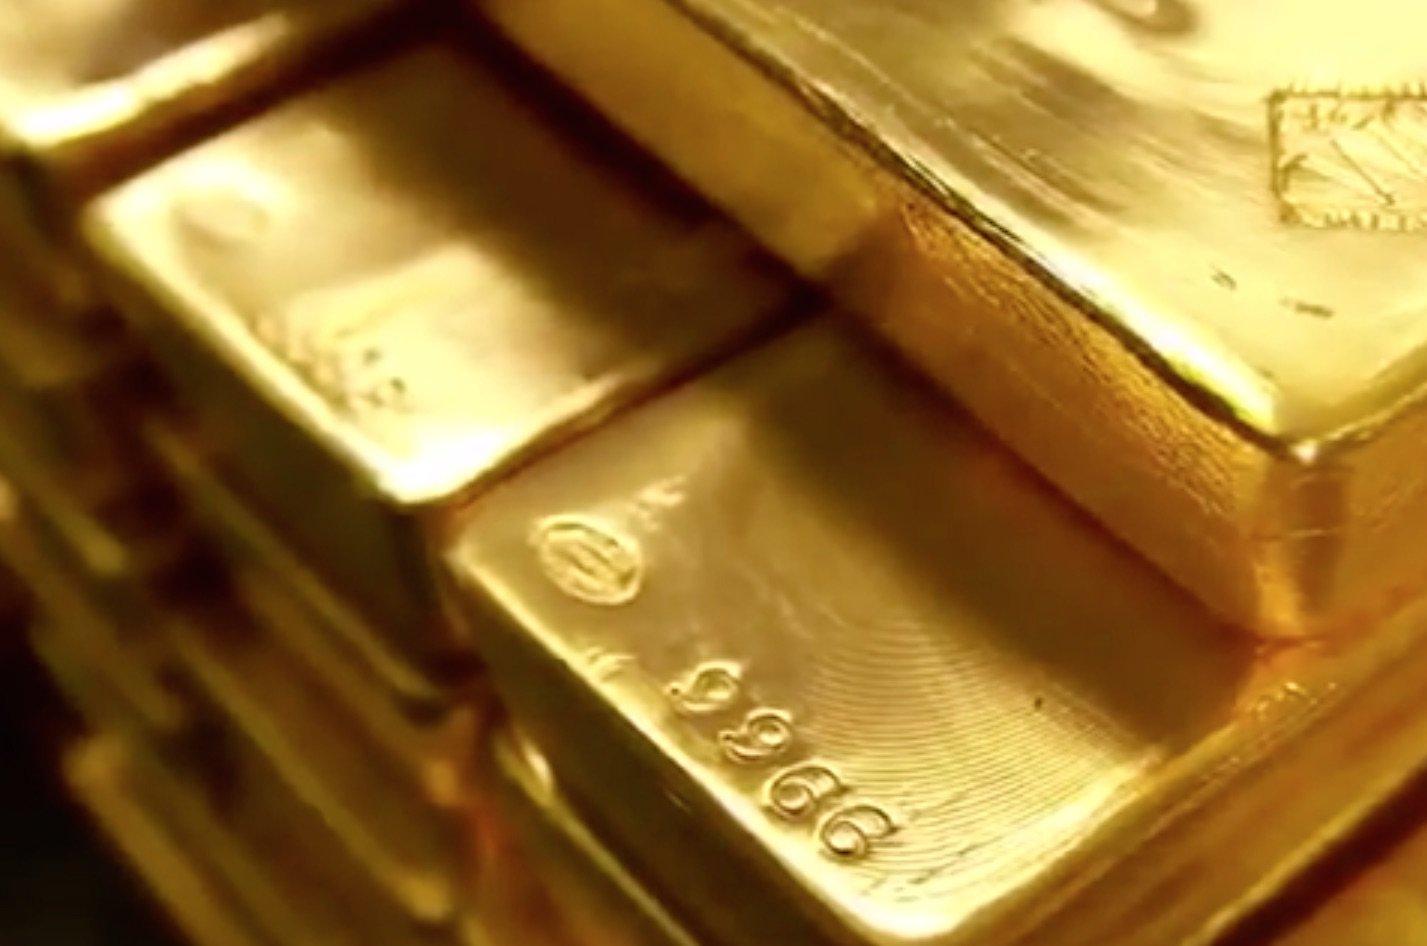 billions of dollars in gold - photo #7